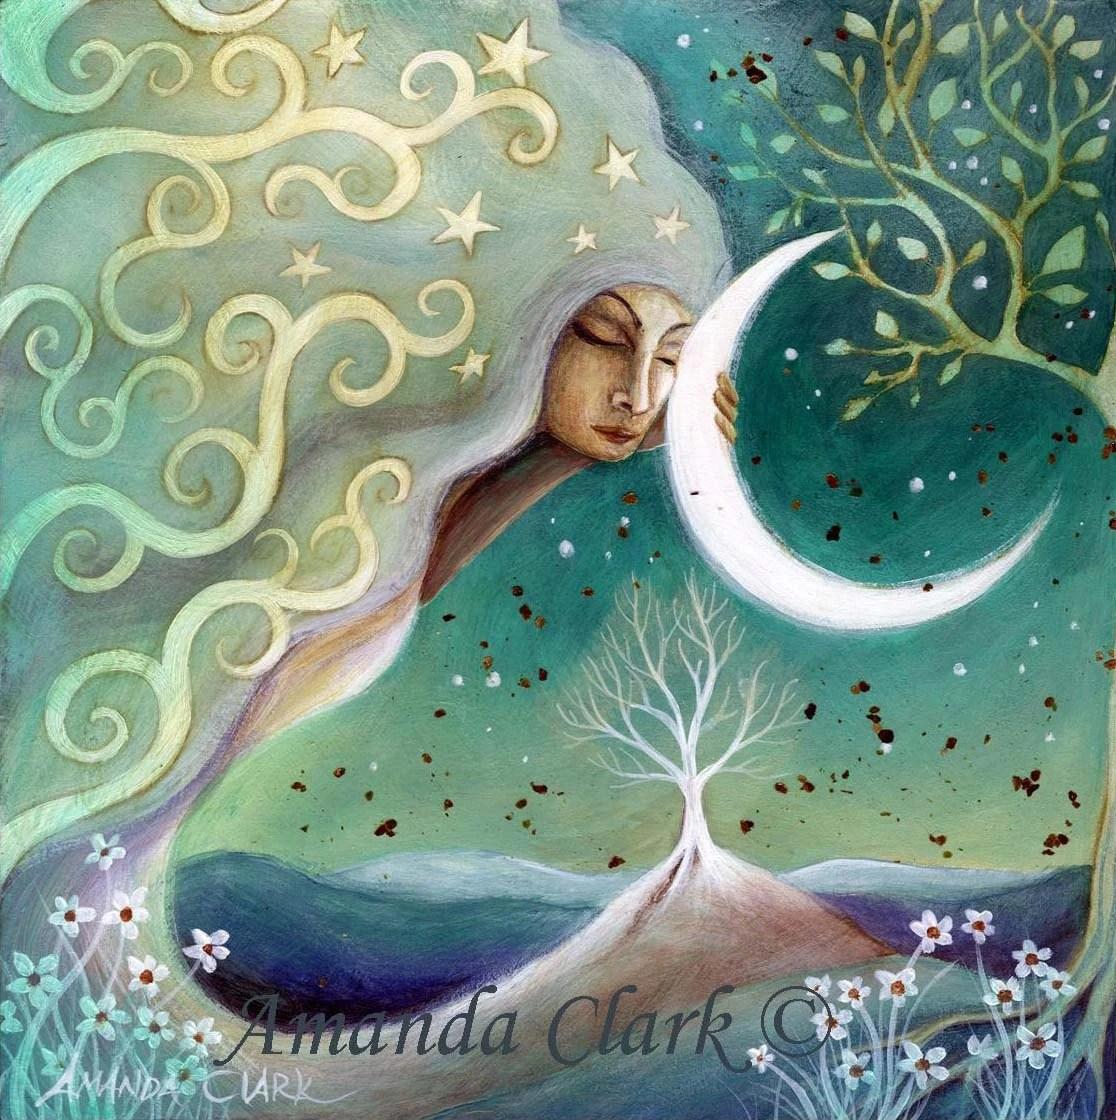 Earth and Moon art print by Amanda Clark - earthangelsarts